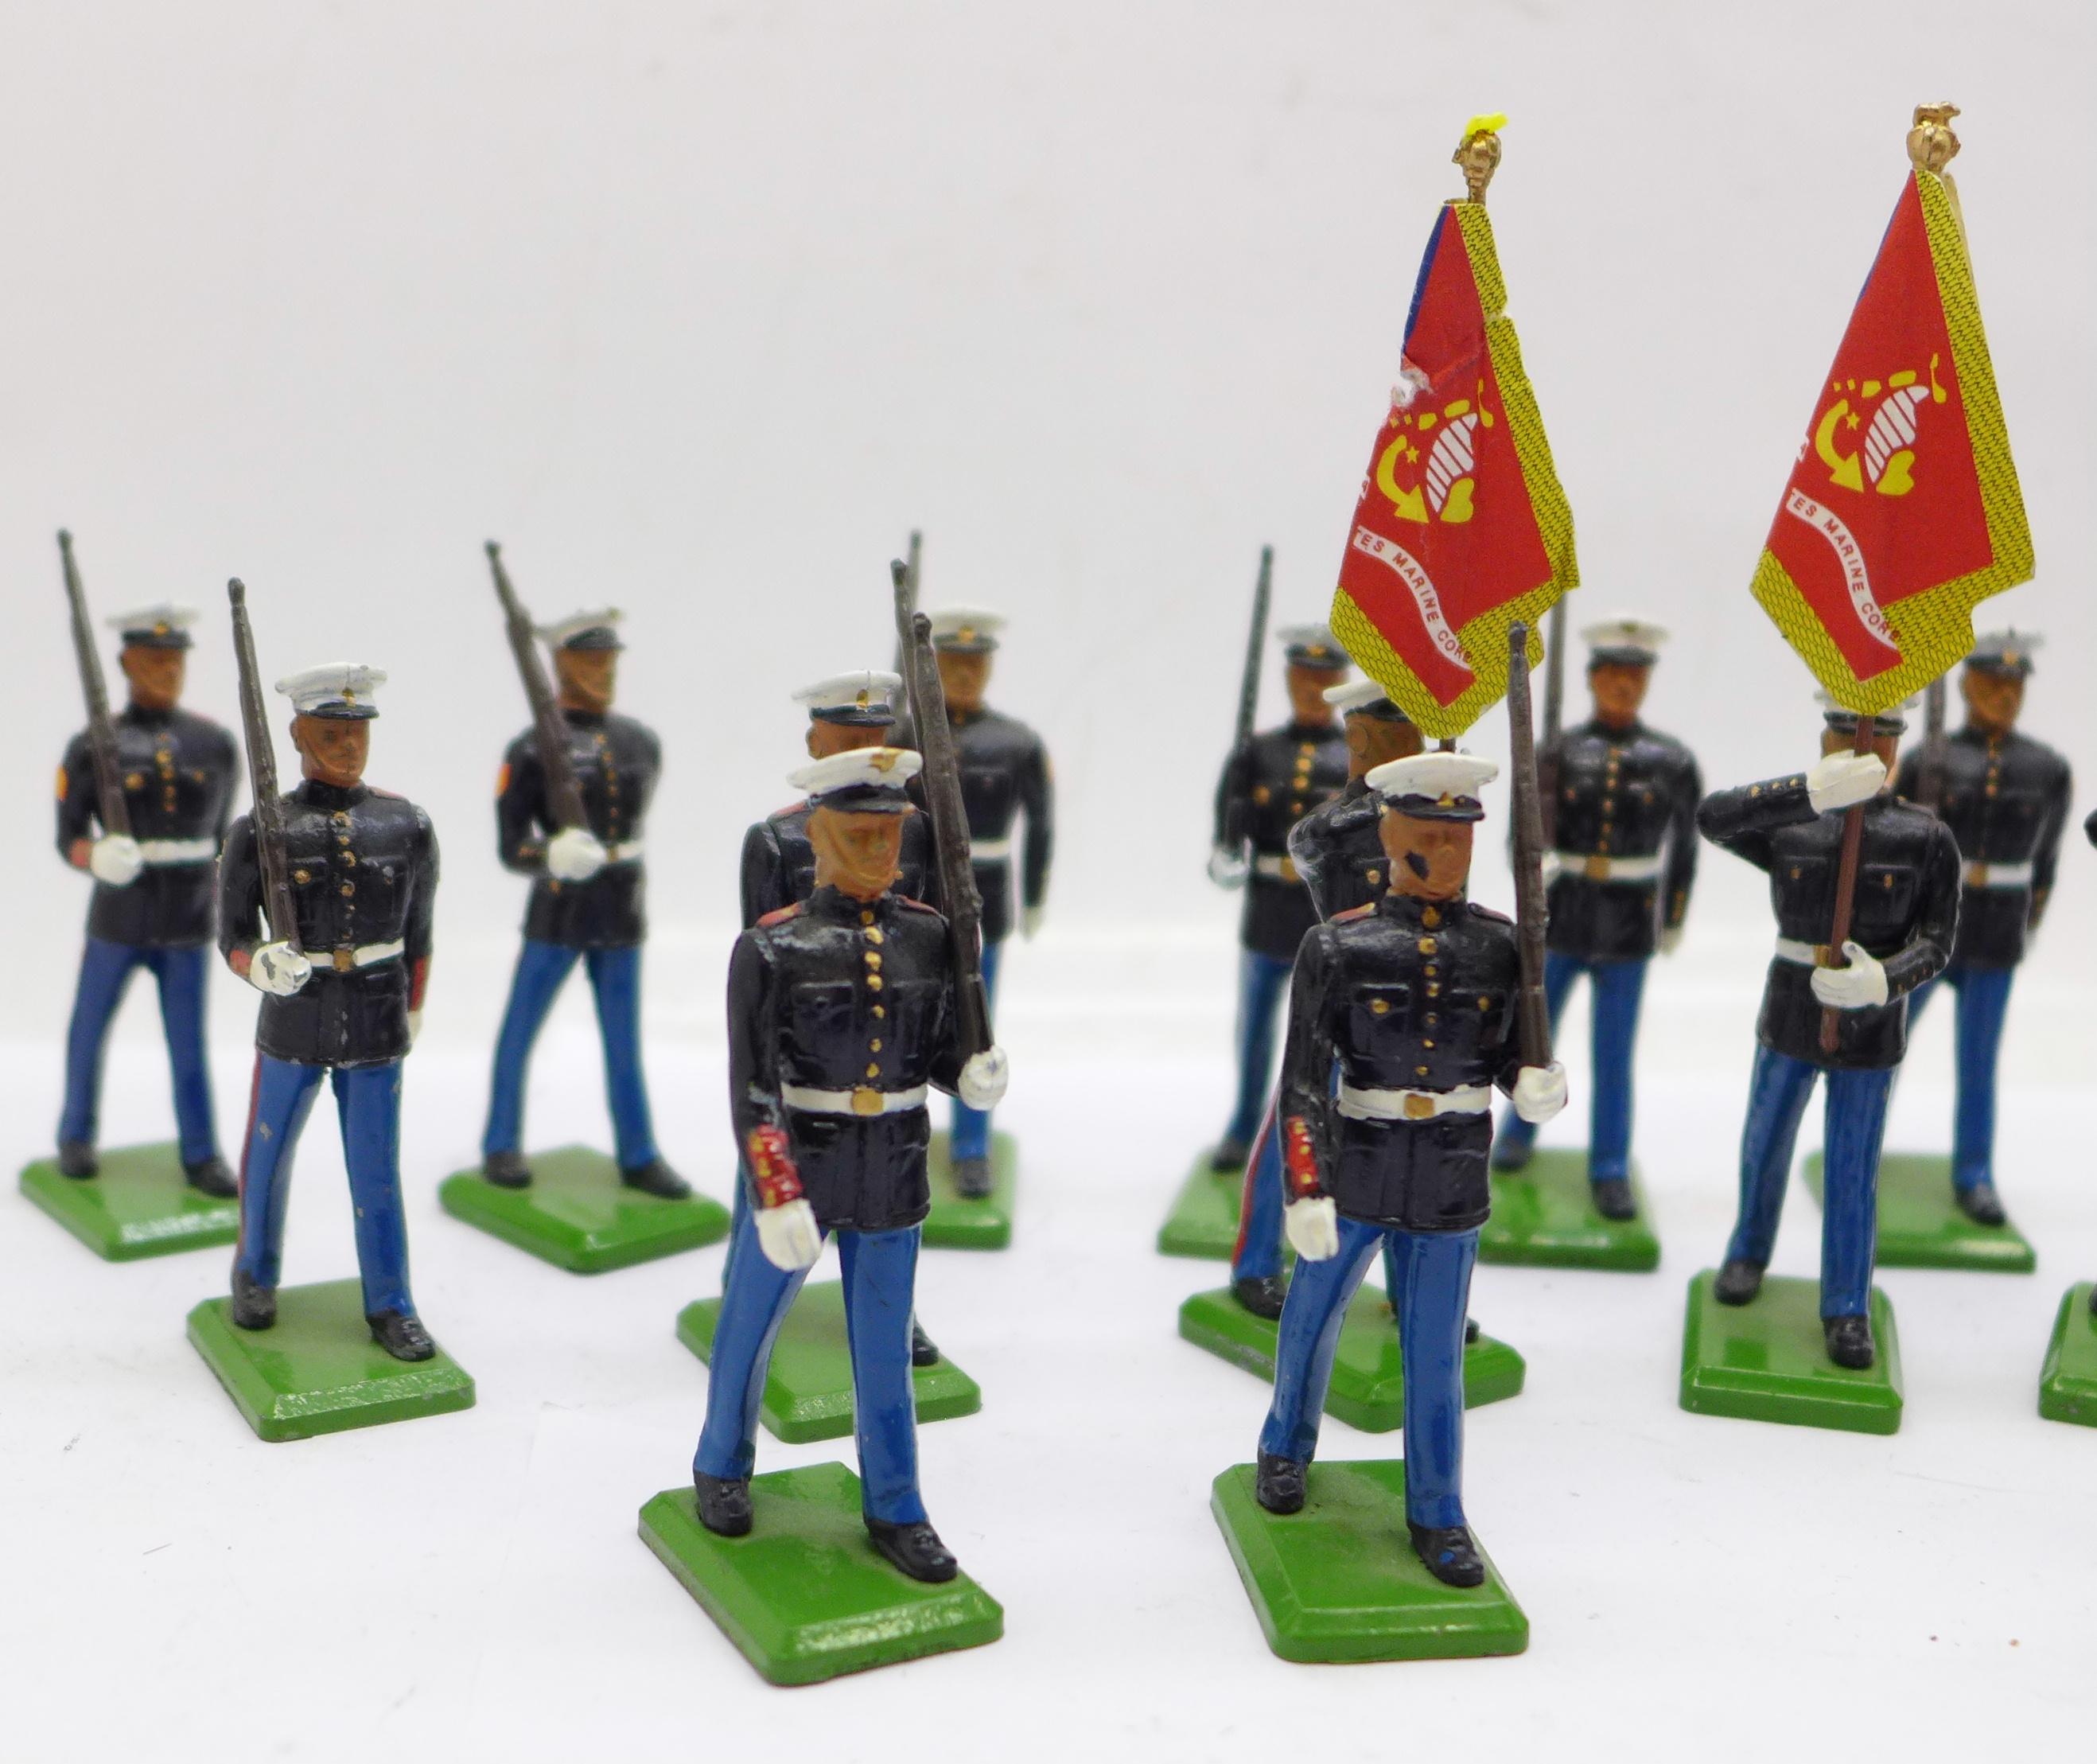 Twenty 1986 Britains Toys marching U.S. Marine figures - Image 2 of 5